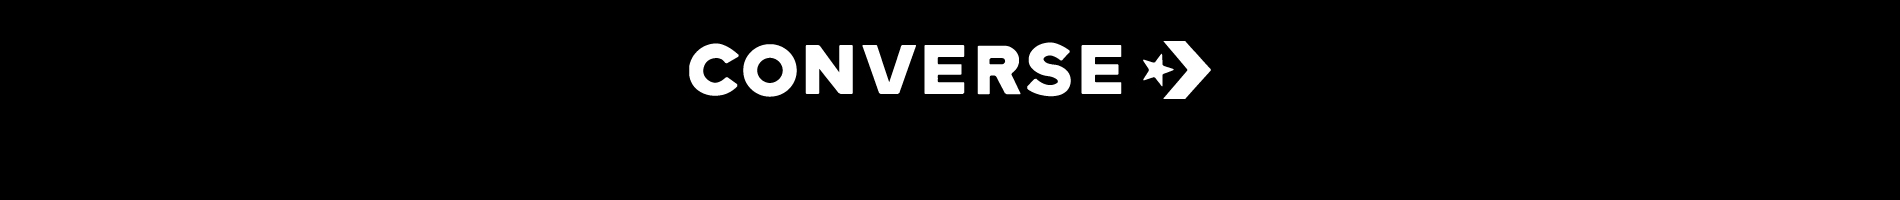 baner-converse